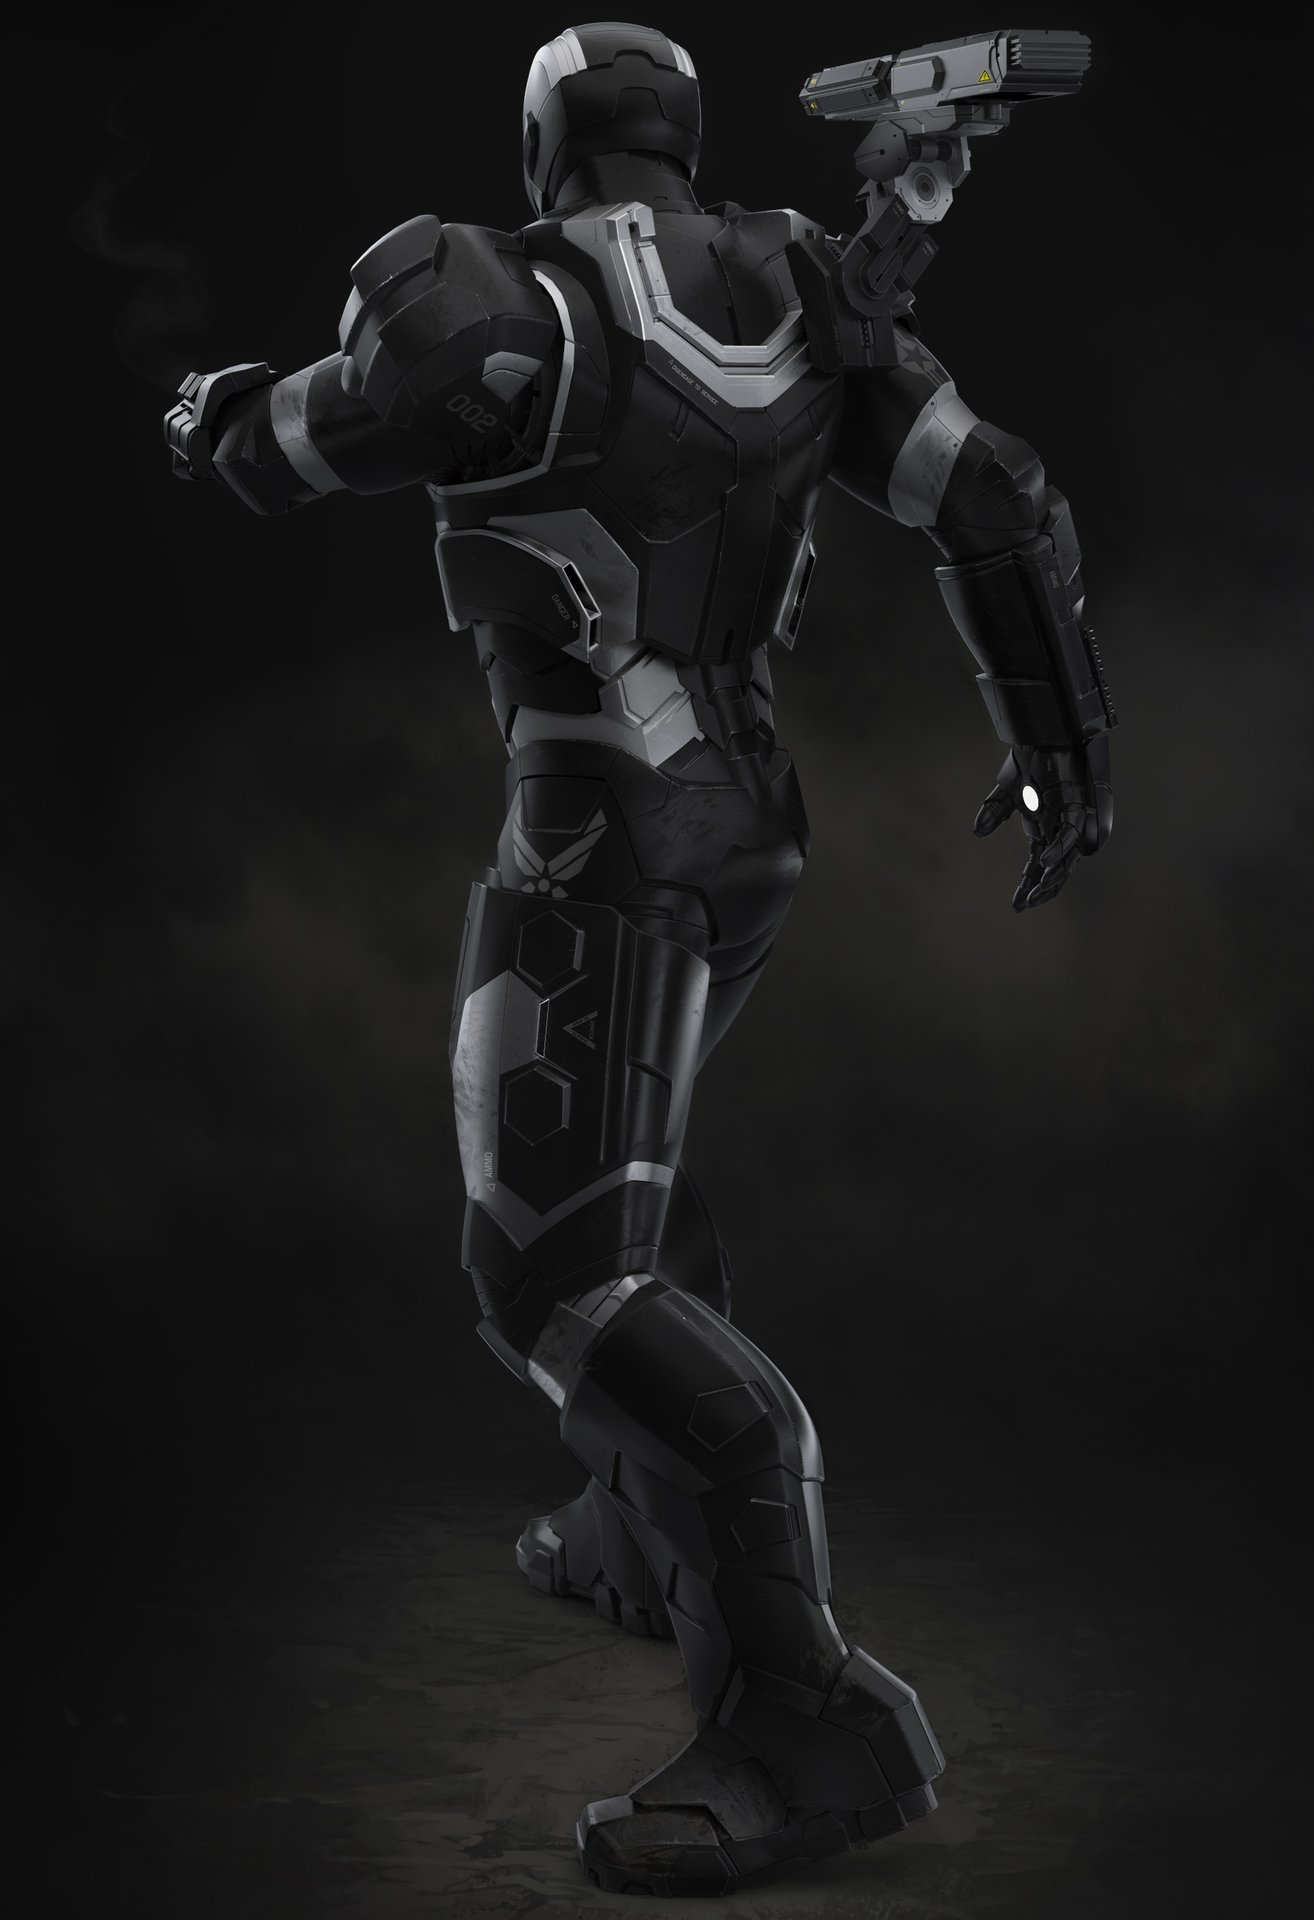 Droidsforsale iron man 3 war machine back